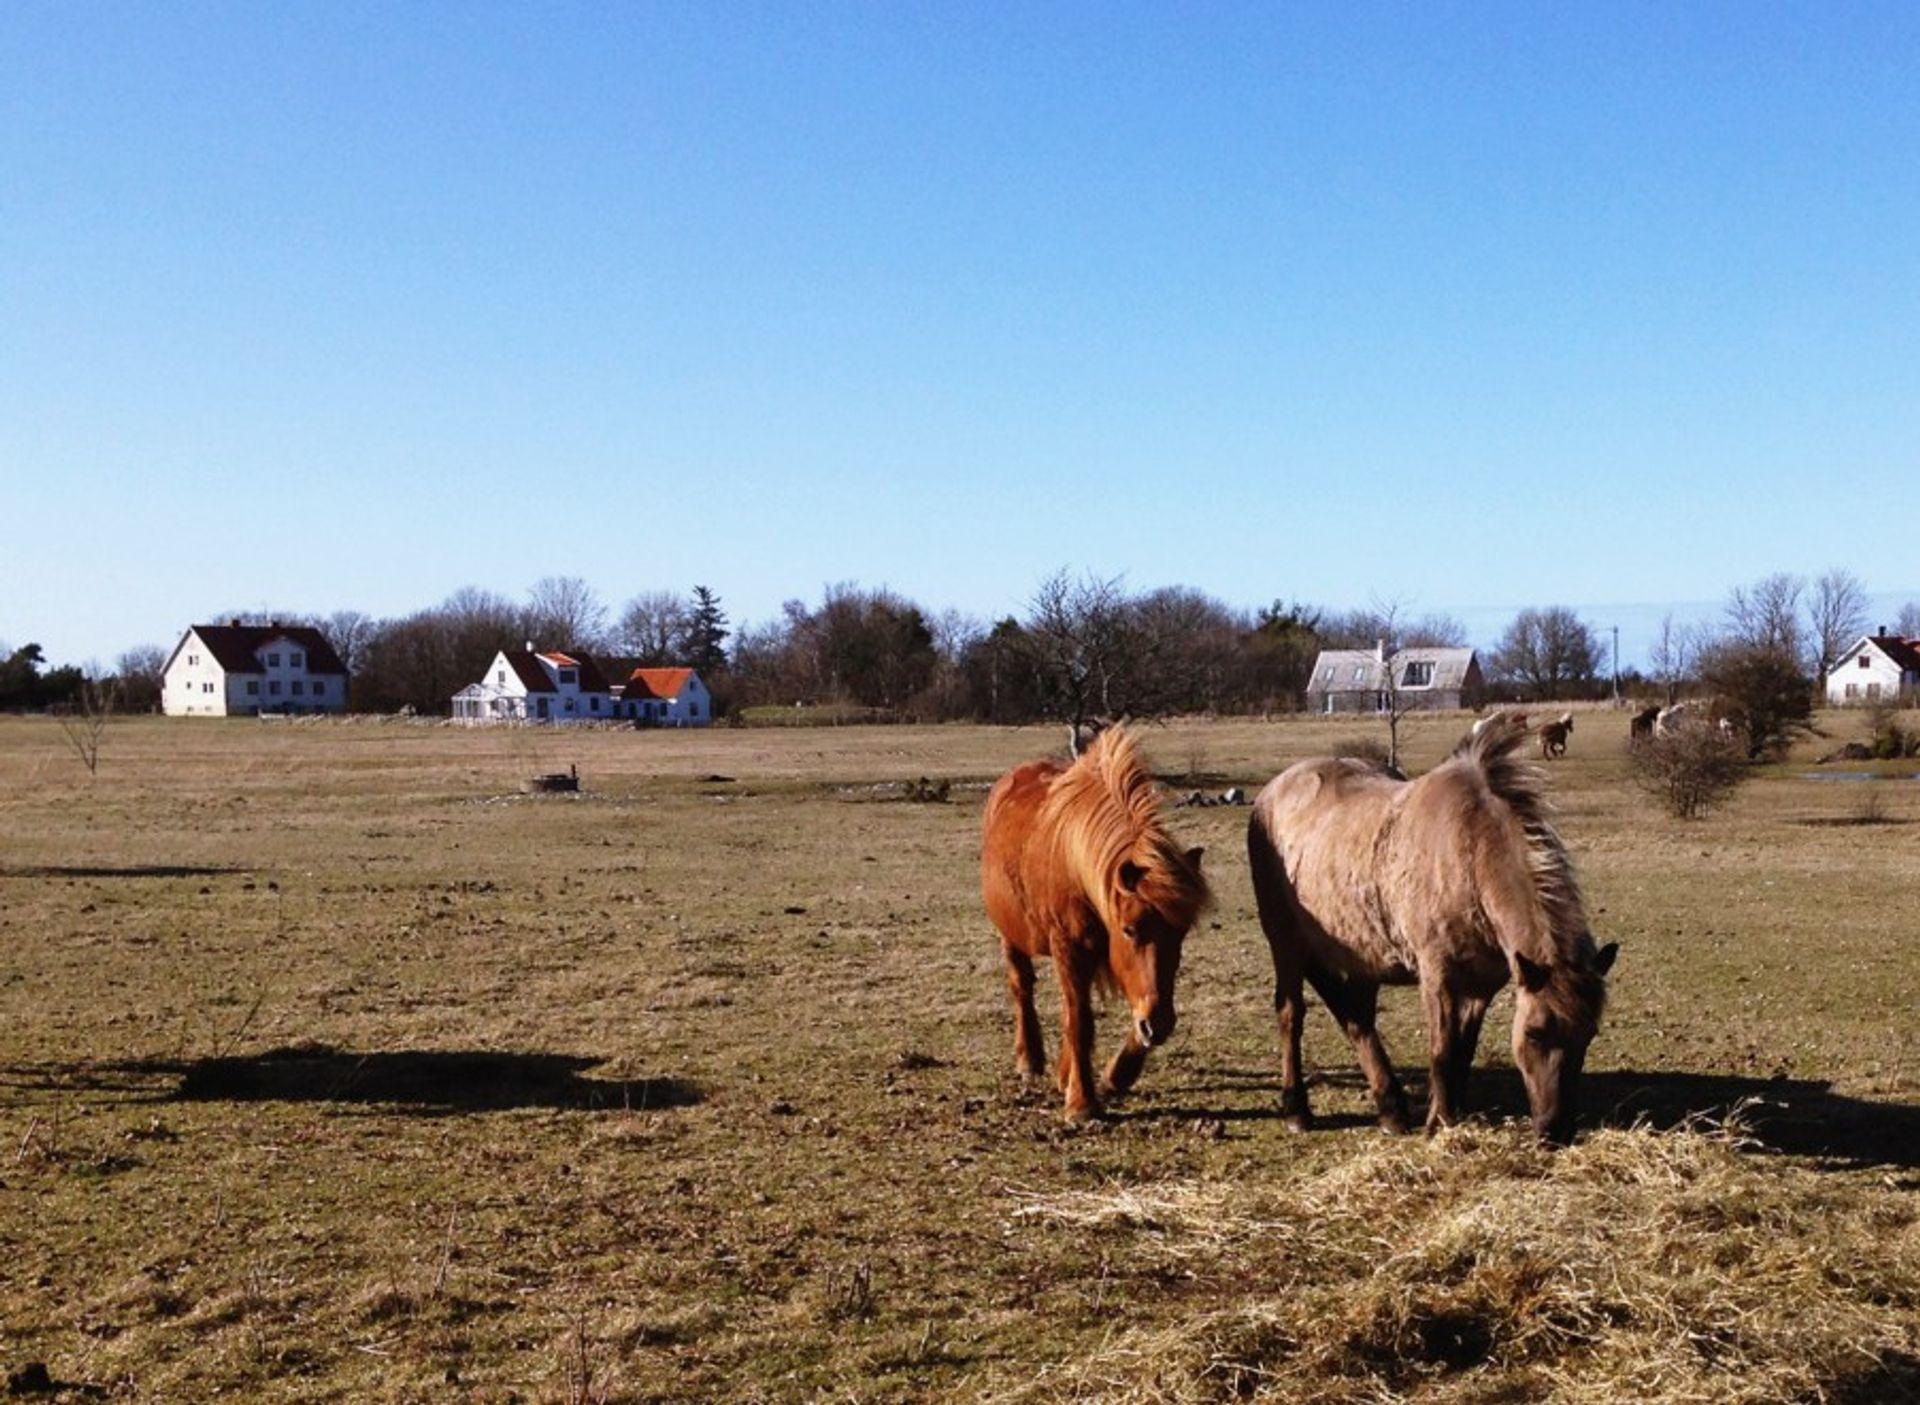 Icelandic horses in Gotland